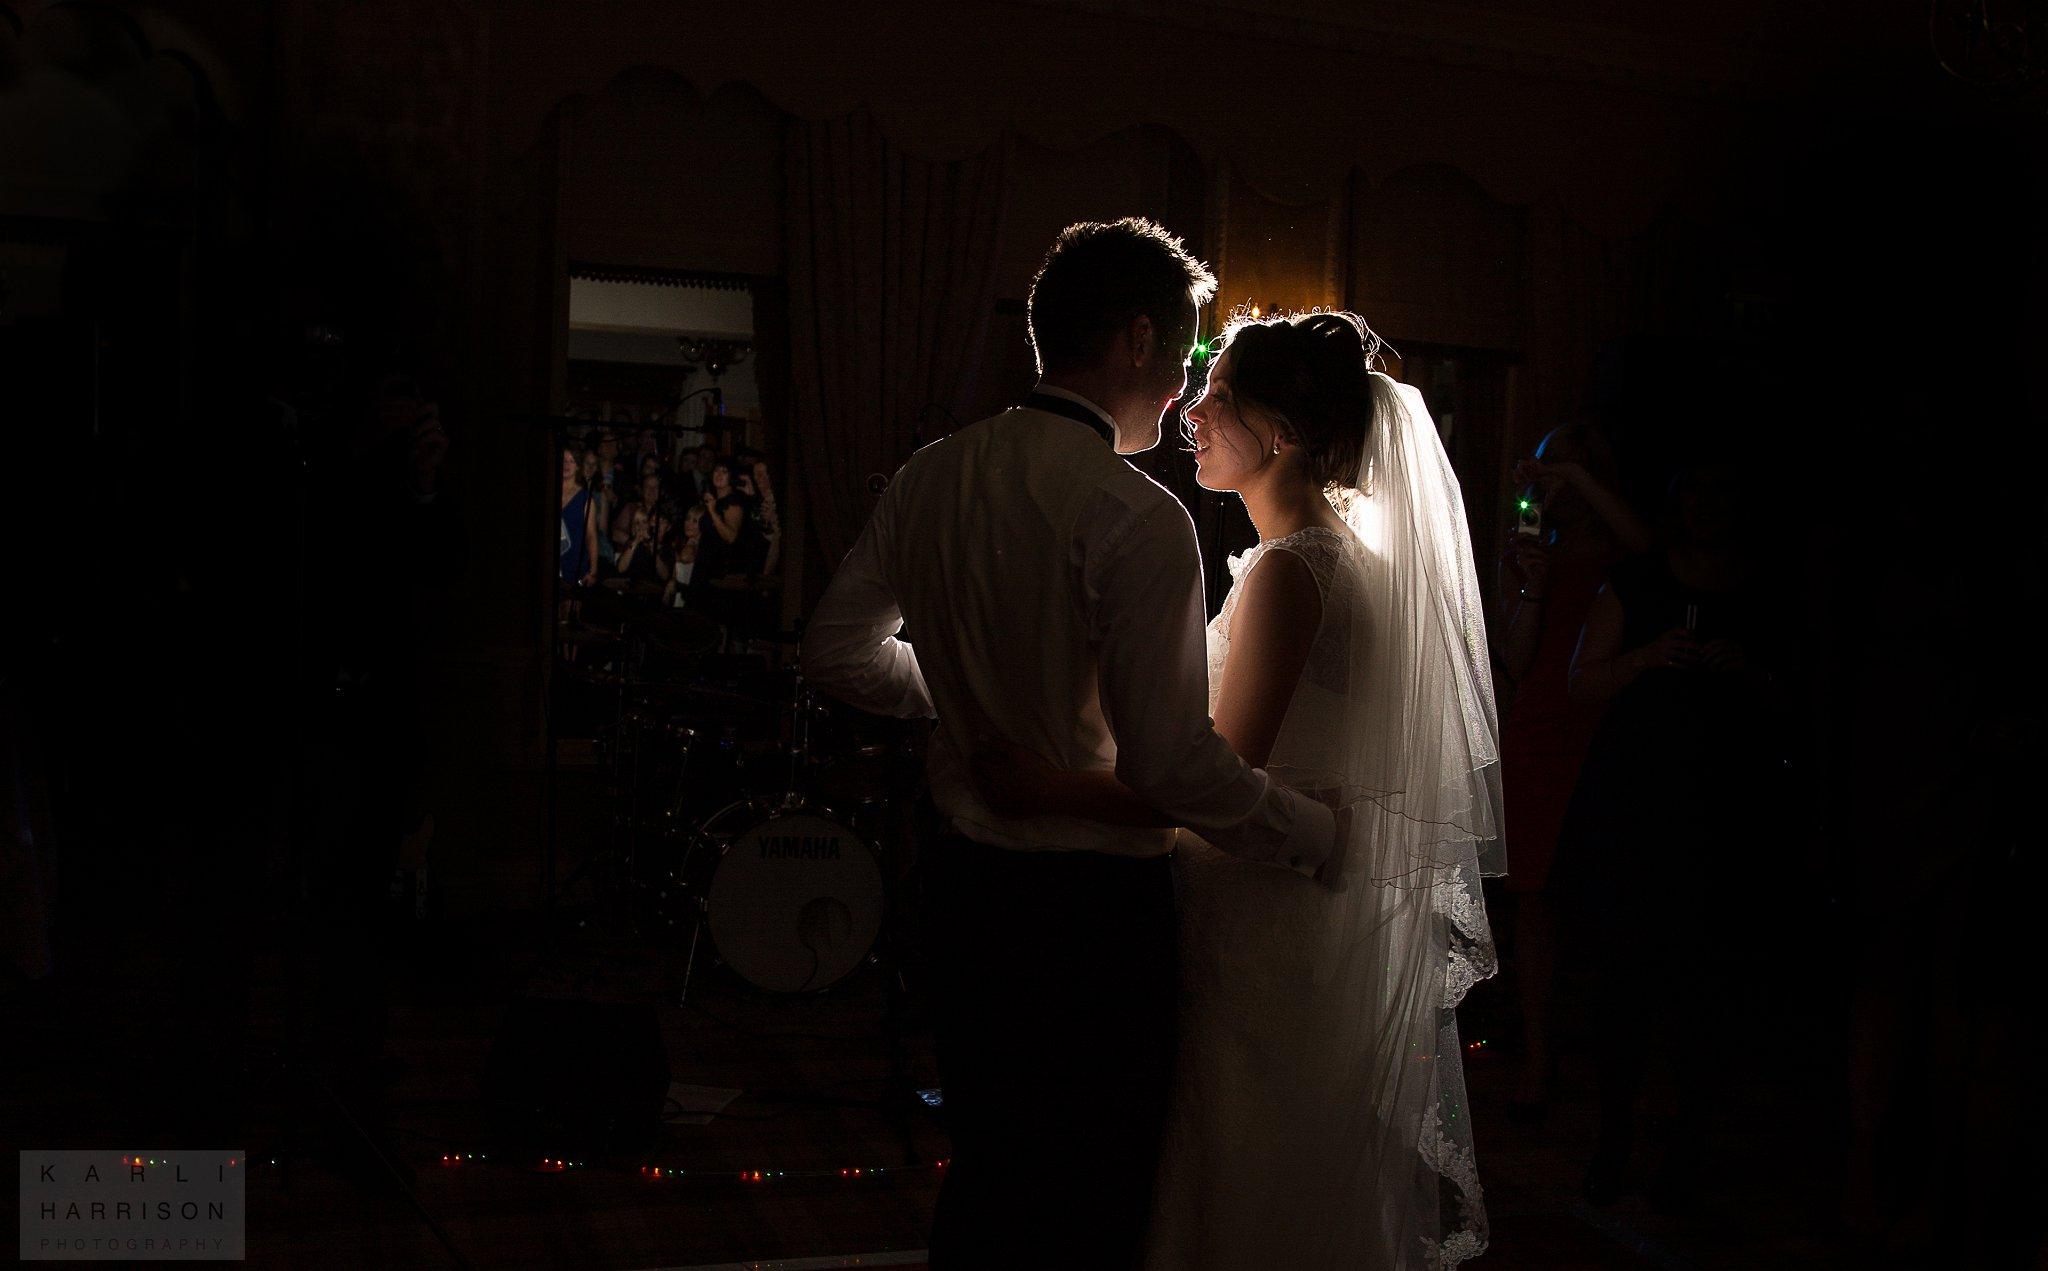 The Merewood Wedding PhotographyCumbria Wedding Photography Award Winning Photographer Karli Harrison Photography